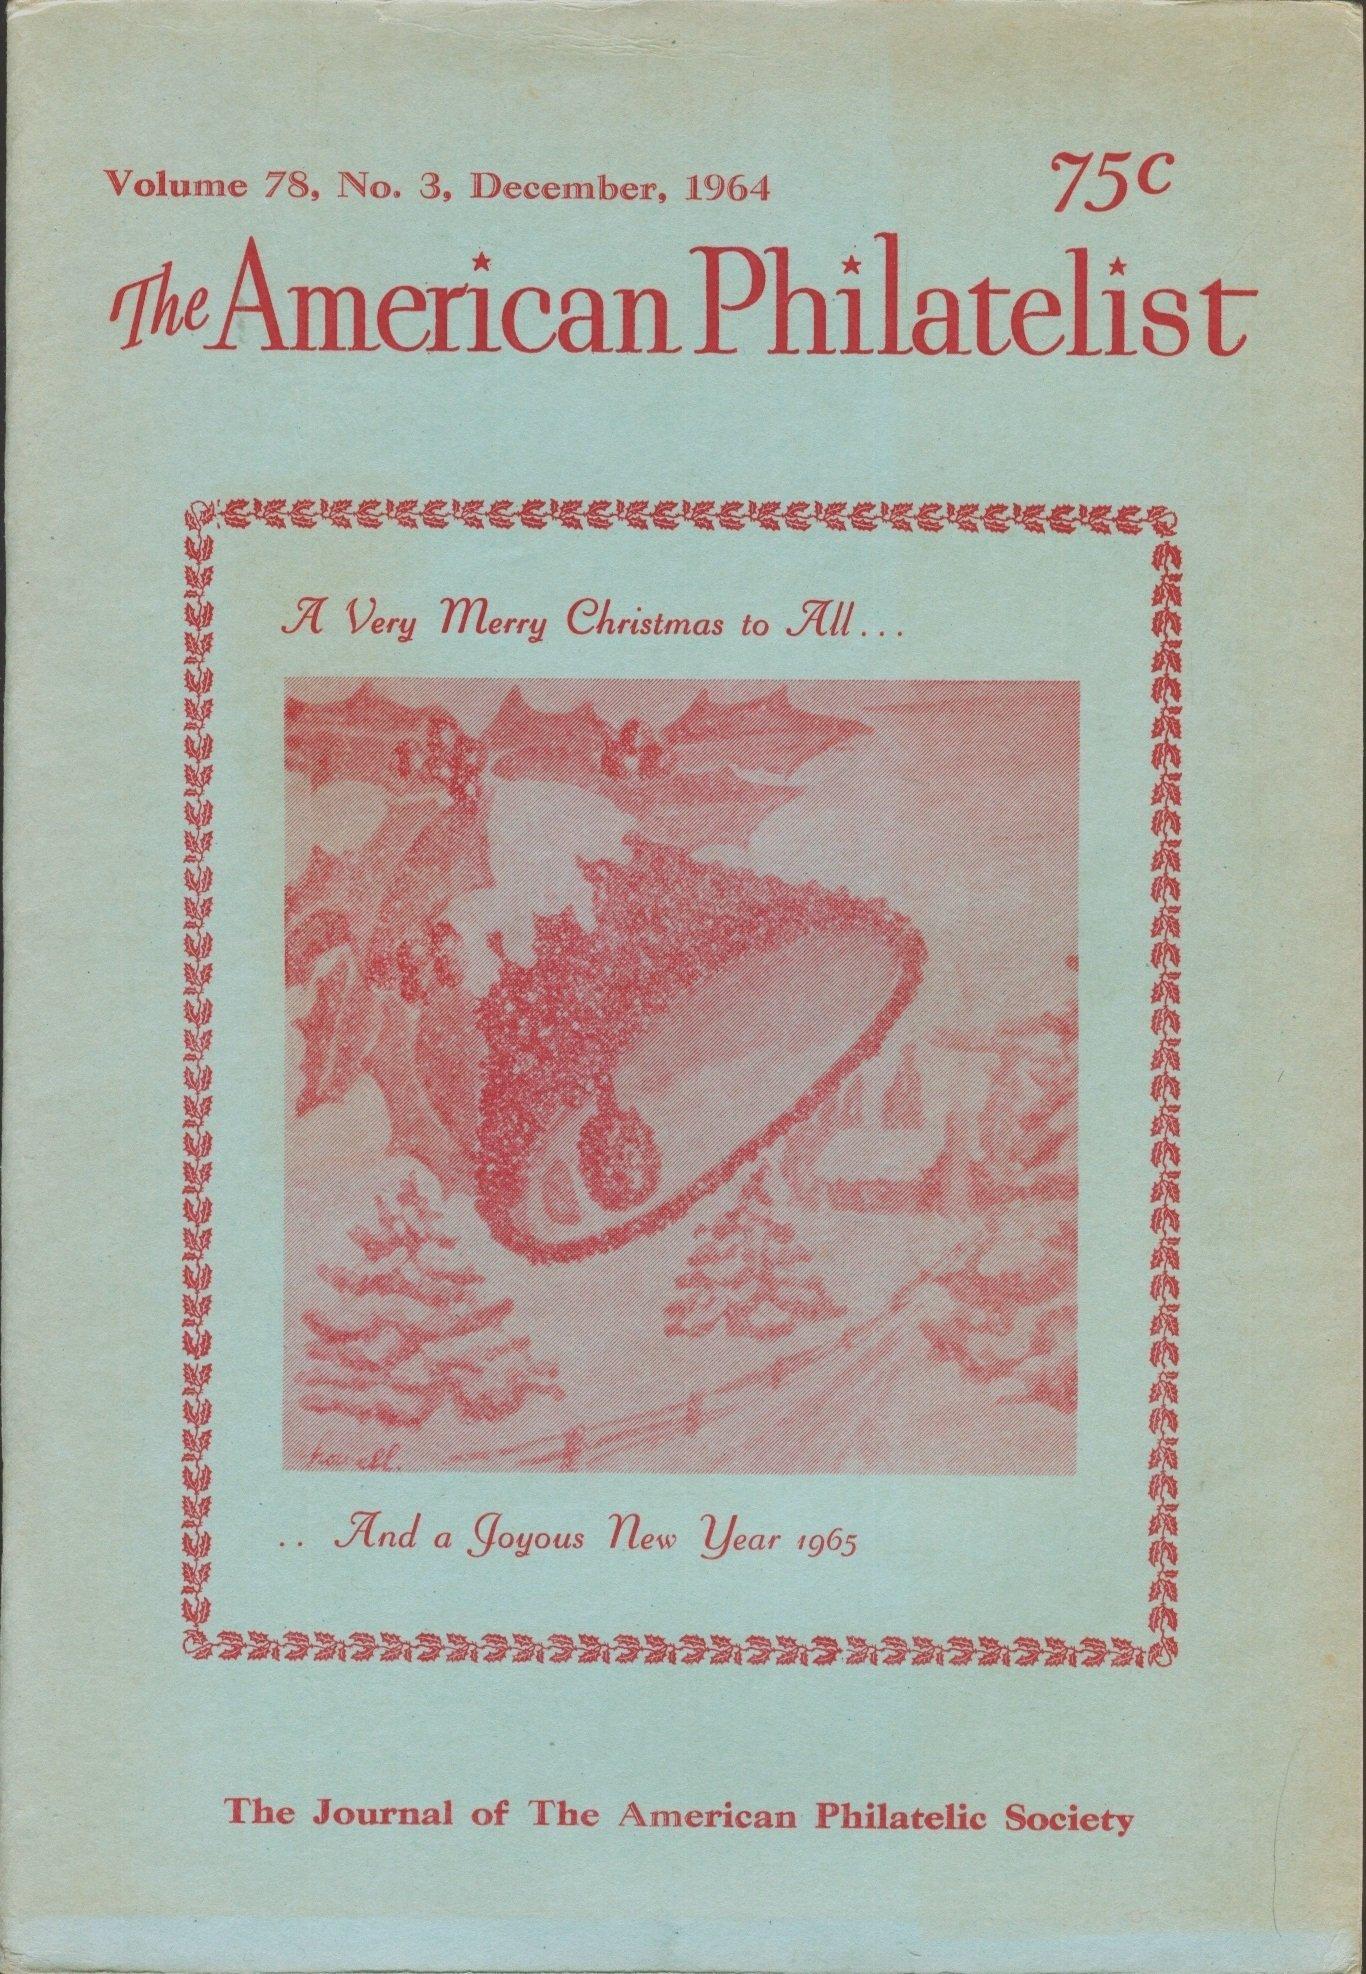 The American Philatelist: Volume 78, No  3, December 1964